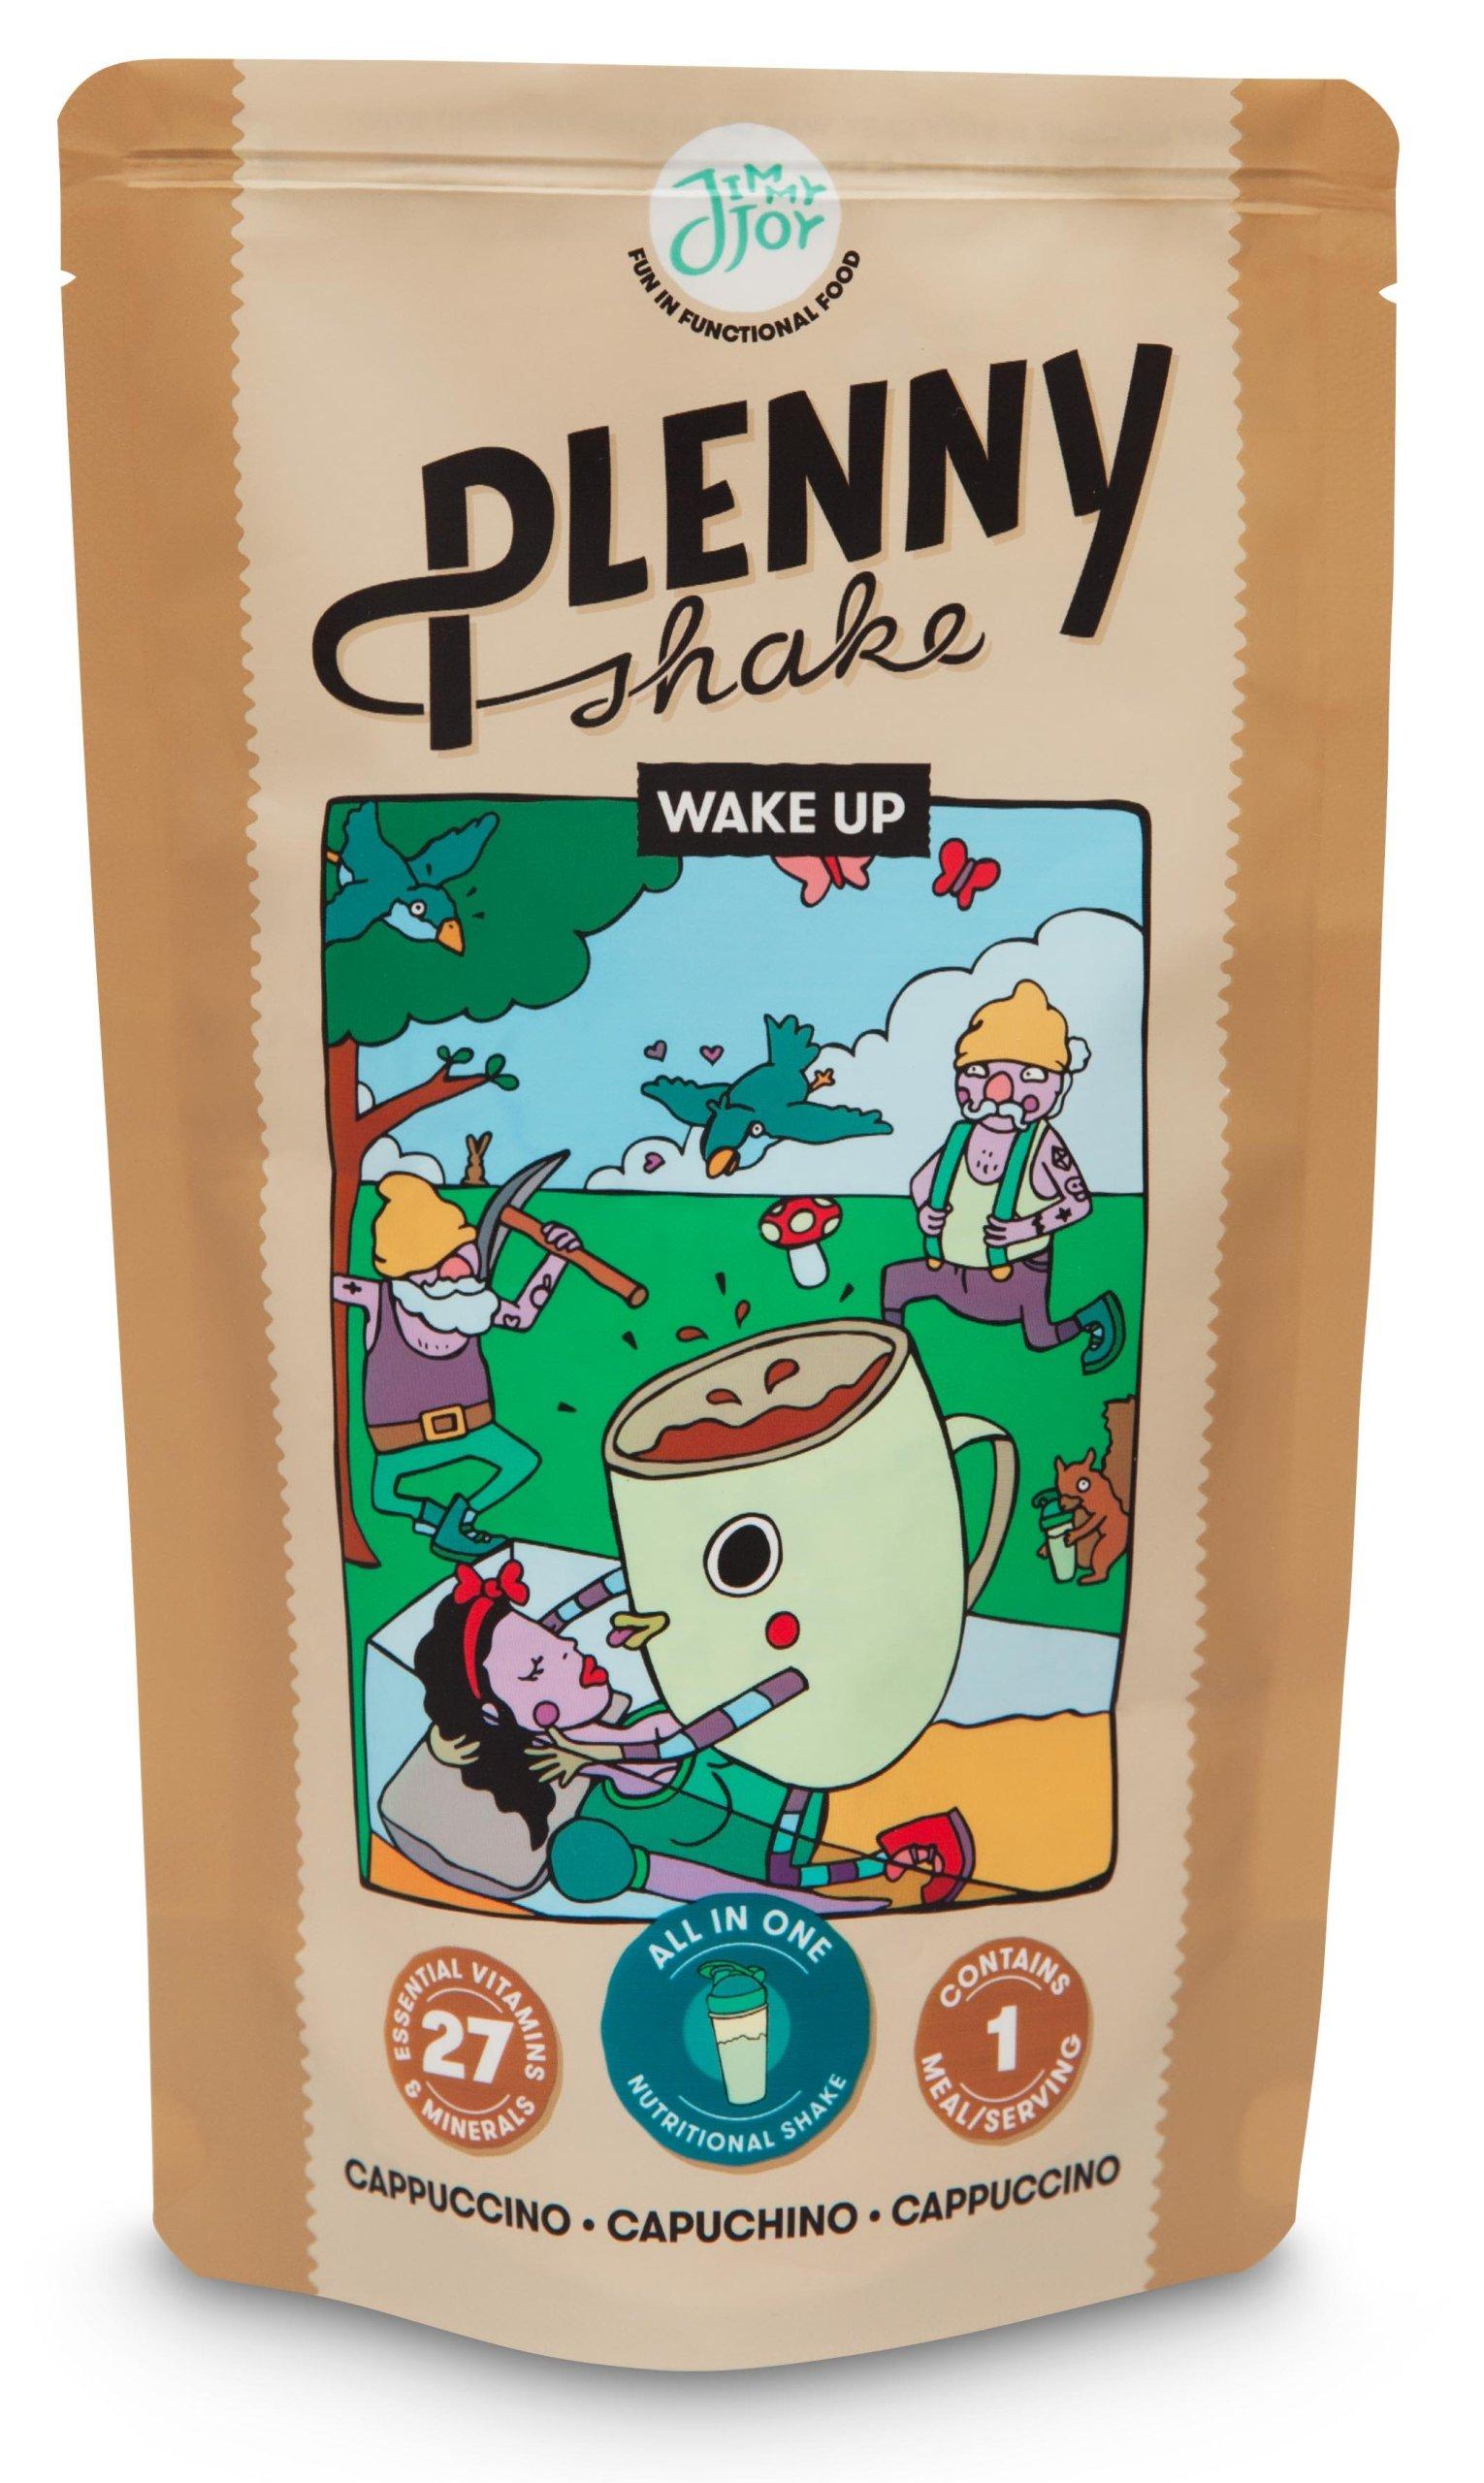 Plenny Shake Wake Up - szejk.it!